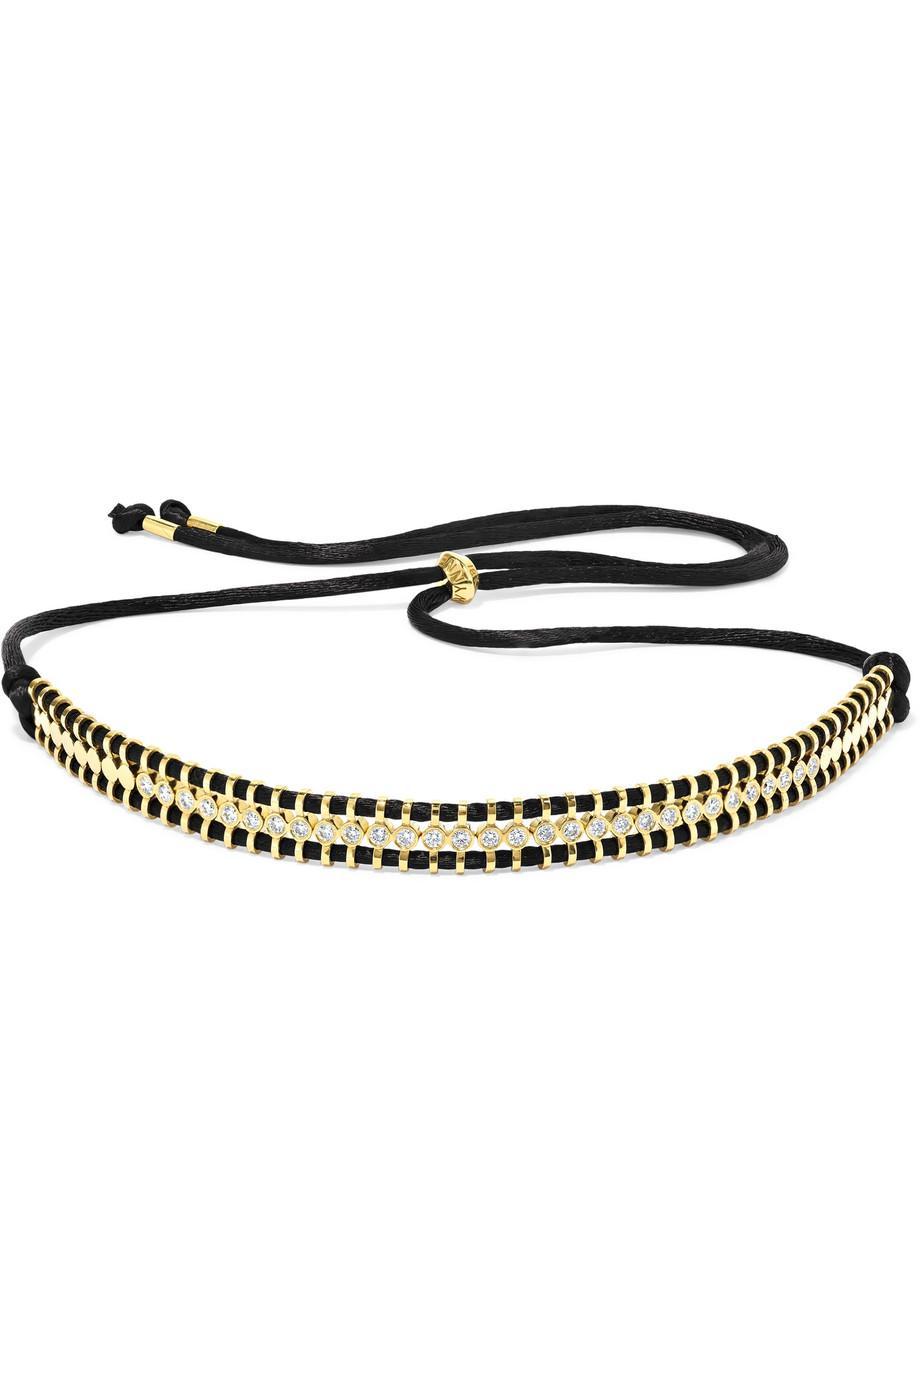 Jemma Wynne 18-karat Gold, Diamond And Cord Necklace